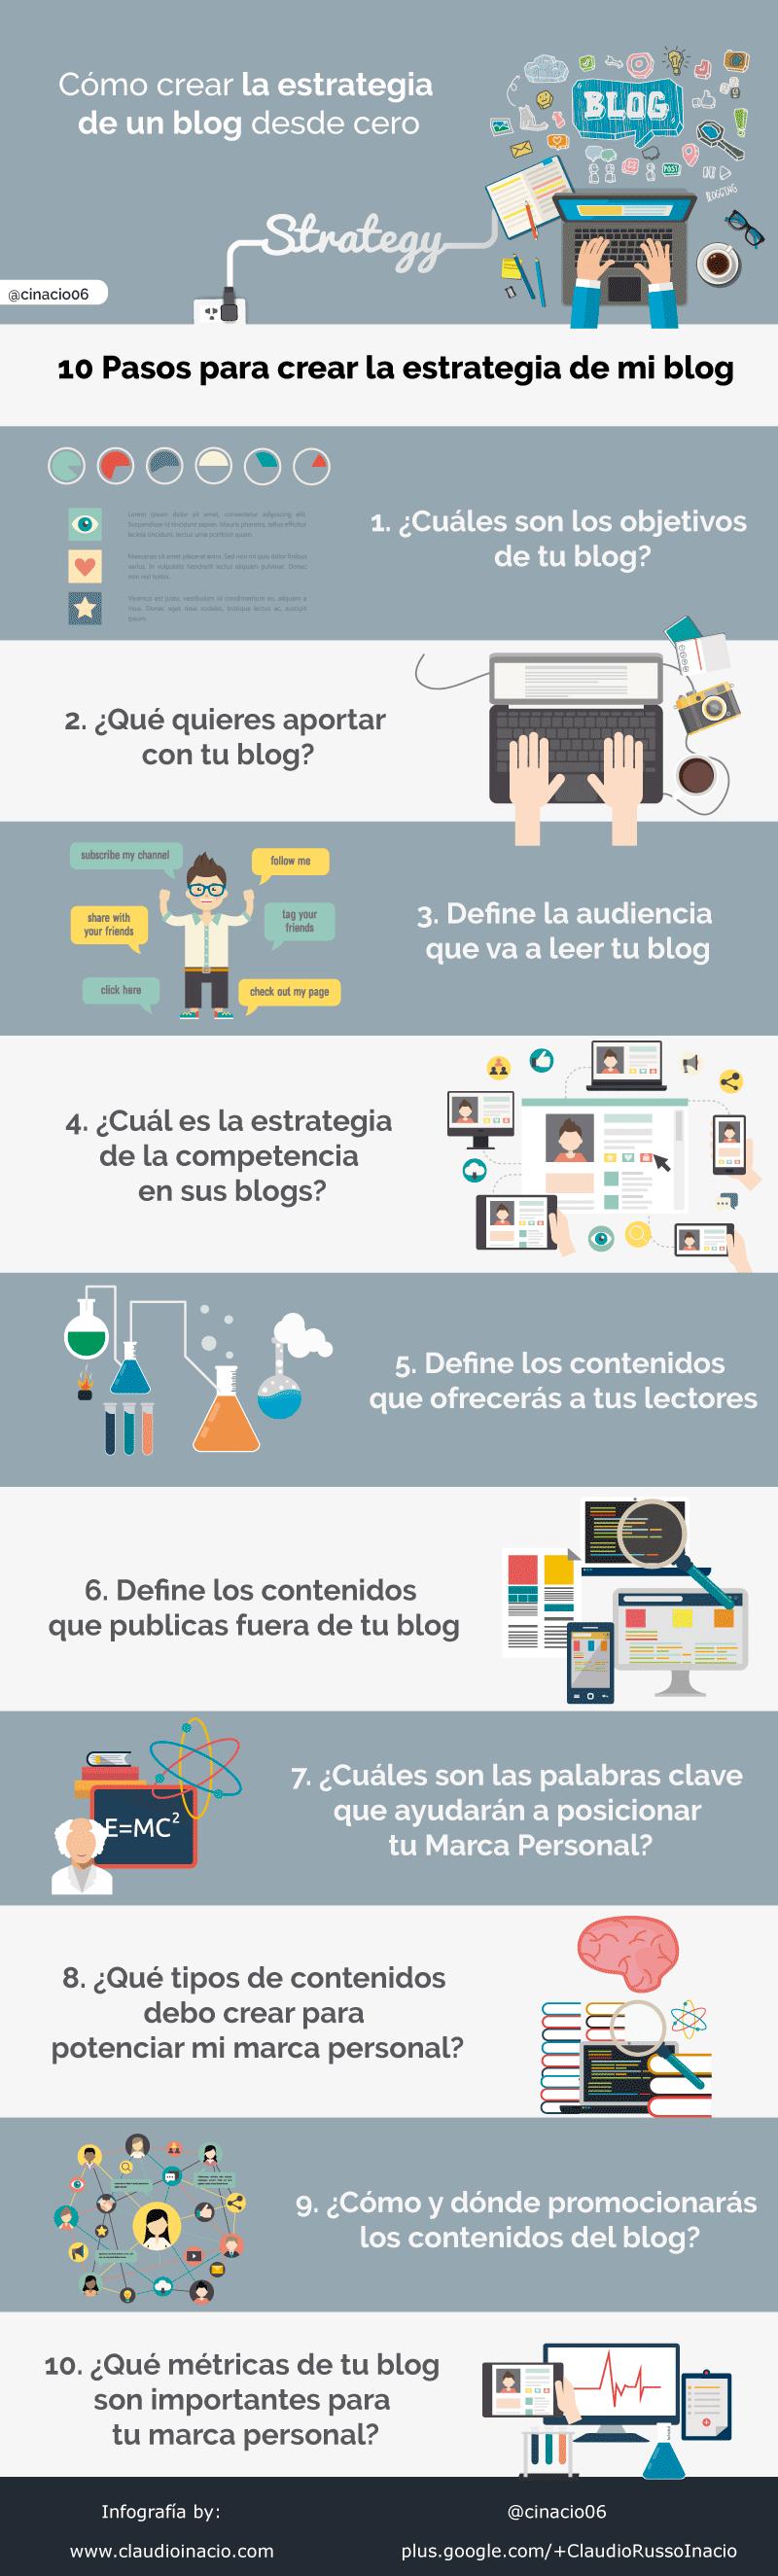 Como-crear-la-estrategia-de-un-blog-infografia[1]